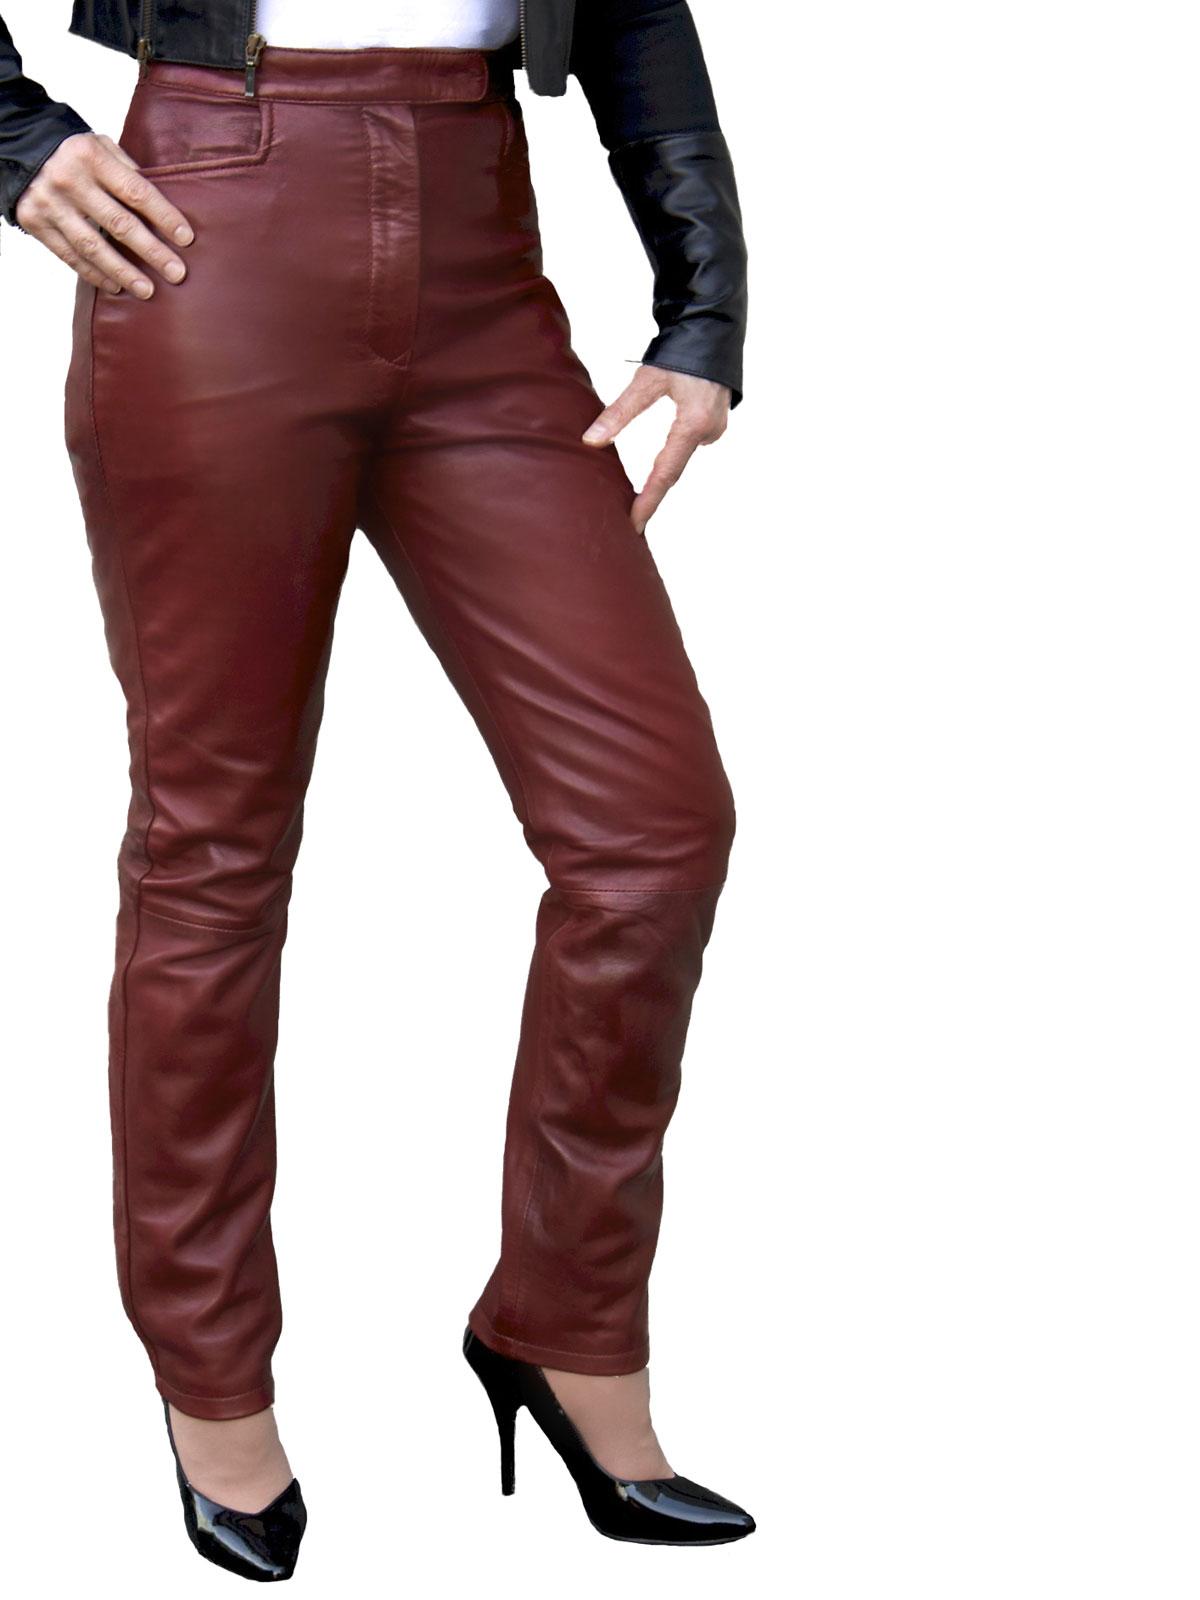 Ladies Burgundy Luxury Leather Trousers